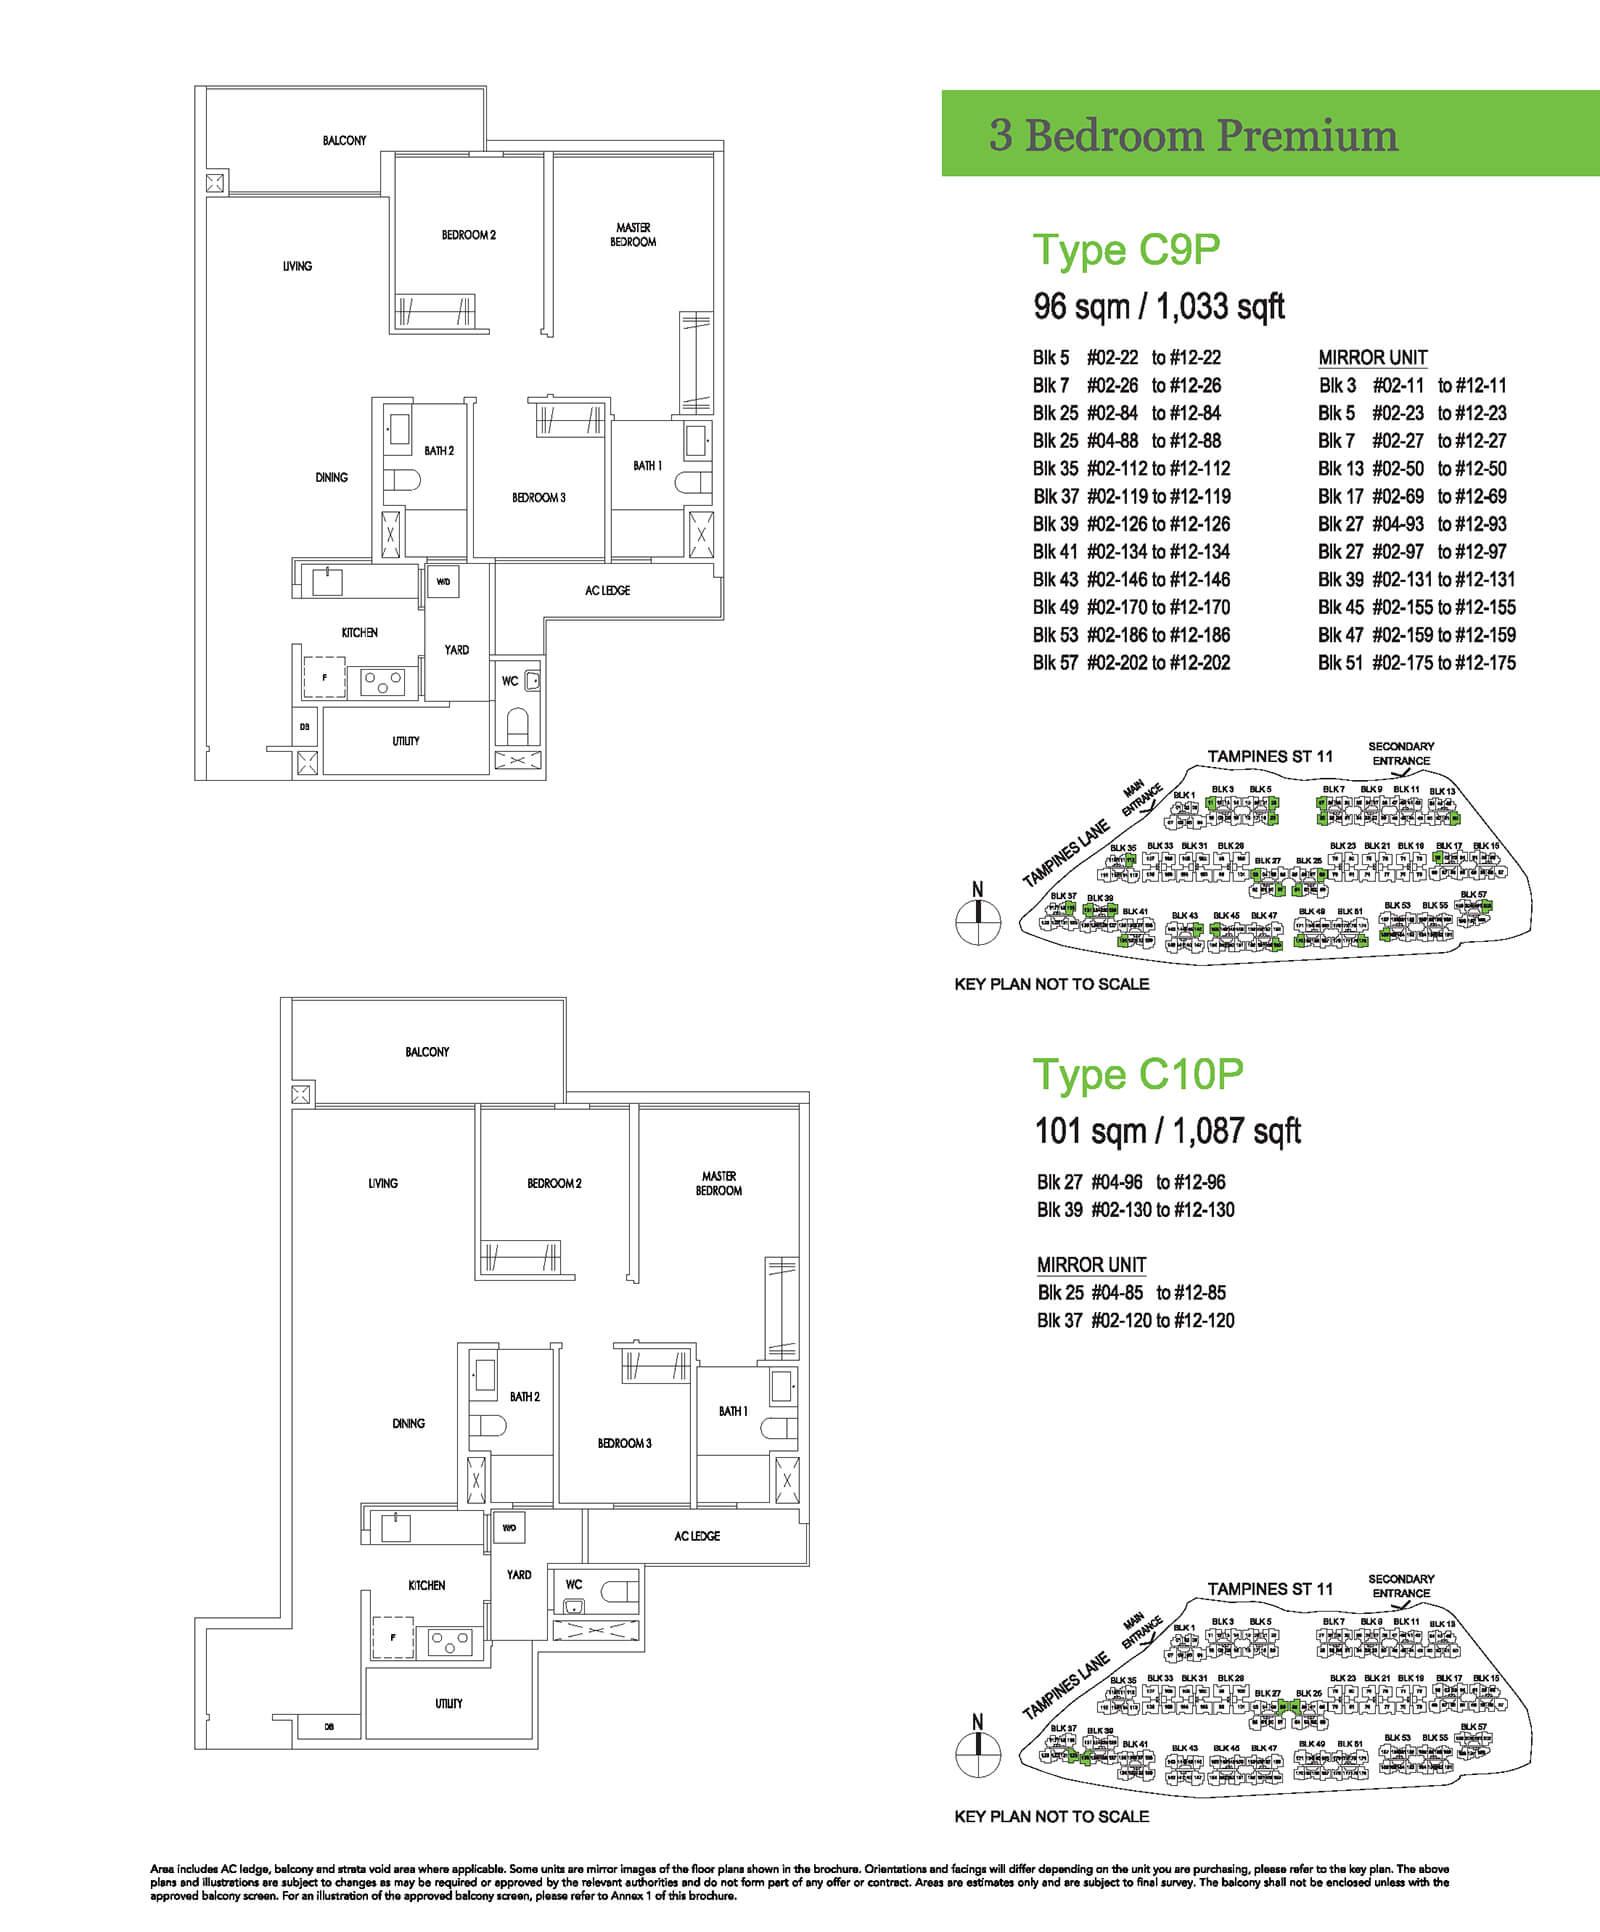 Treasure At Tampines Floor Plan 3-Bedroom Premium C9P C10P